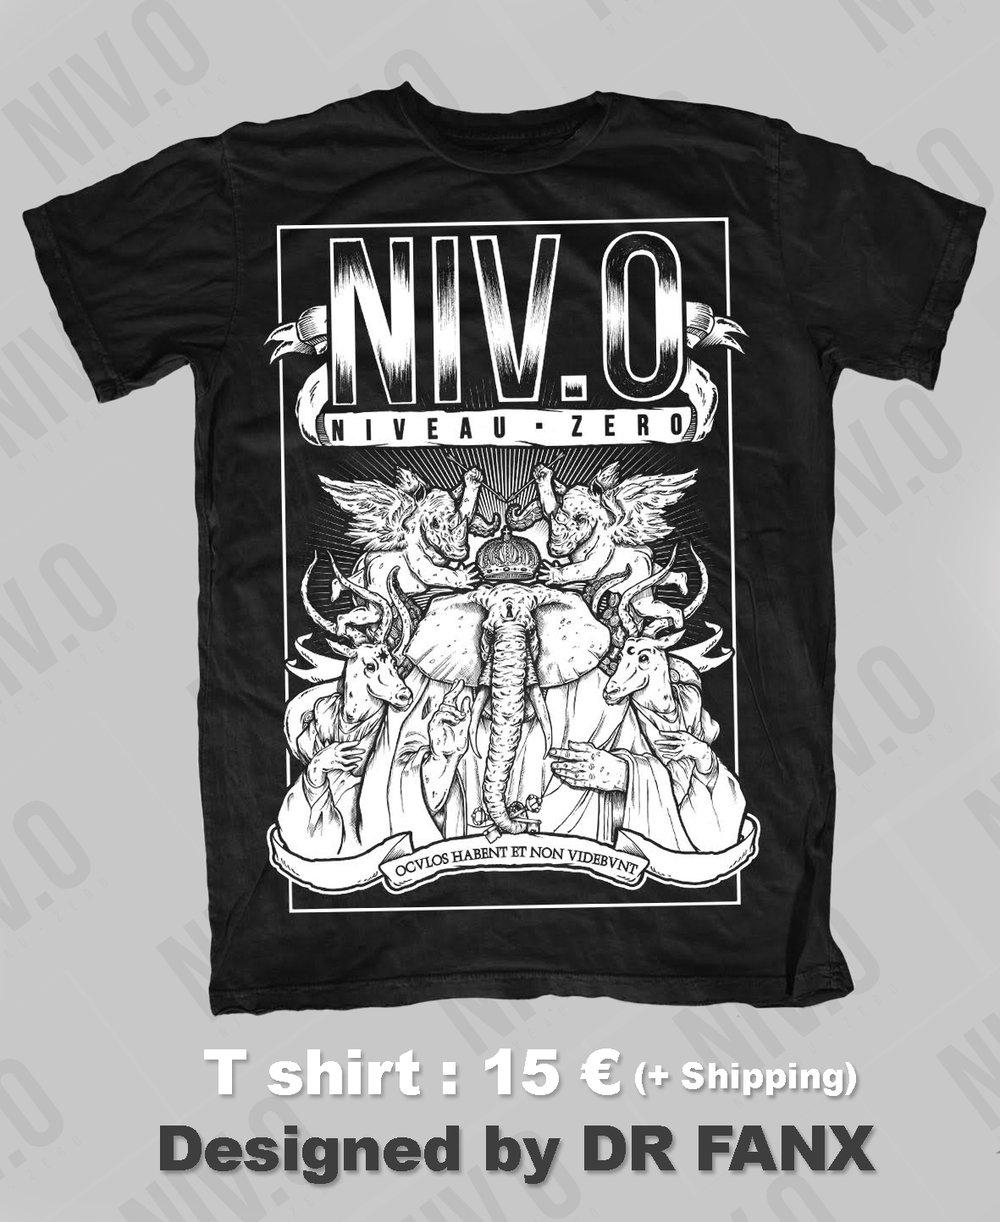 Image of Tshirt : NIVEAU ZERO ( NIV.0 : Hoculos Habent et Non Videbunt)